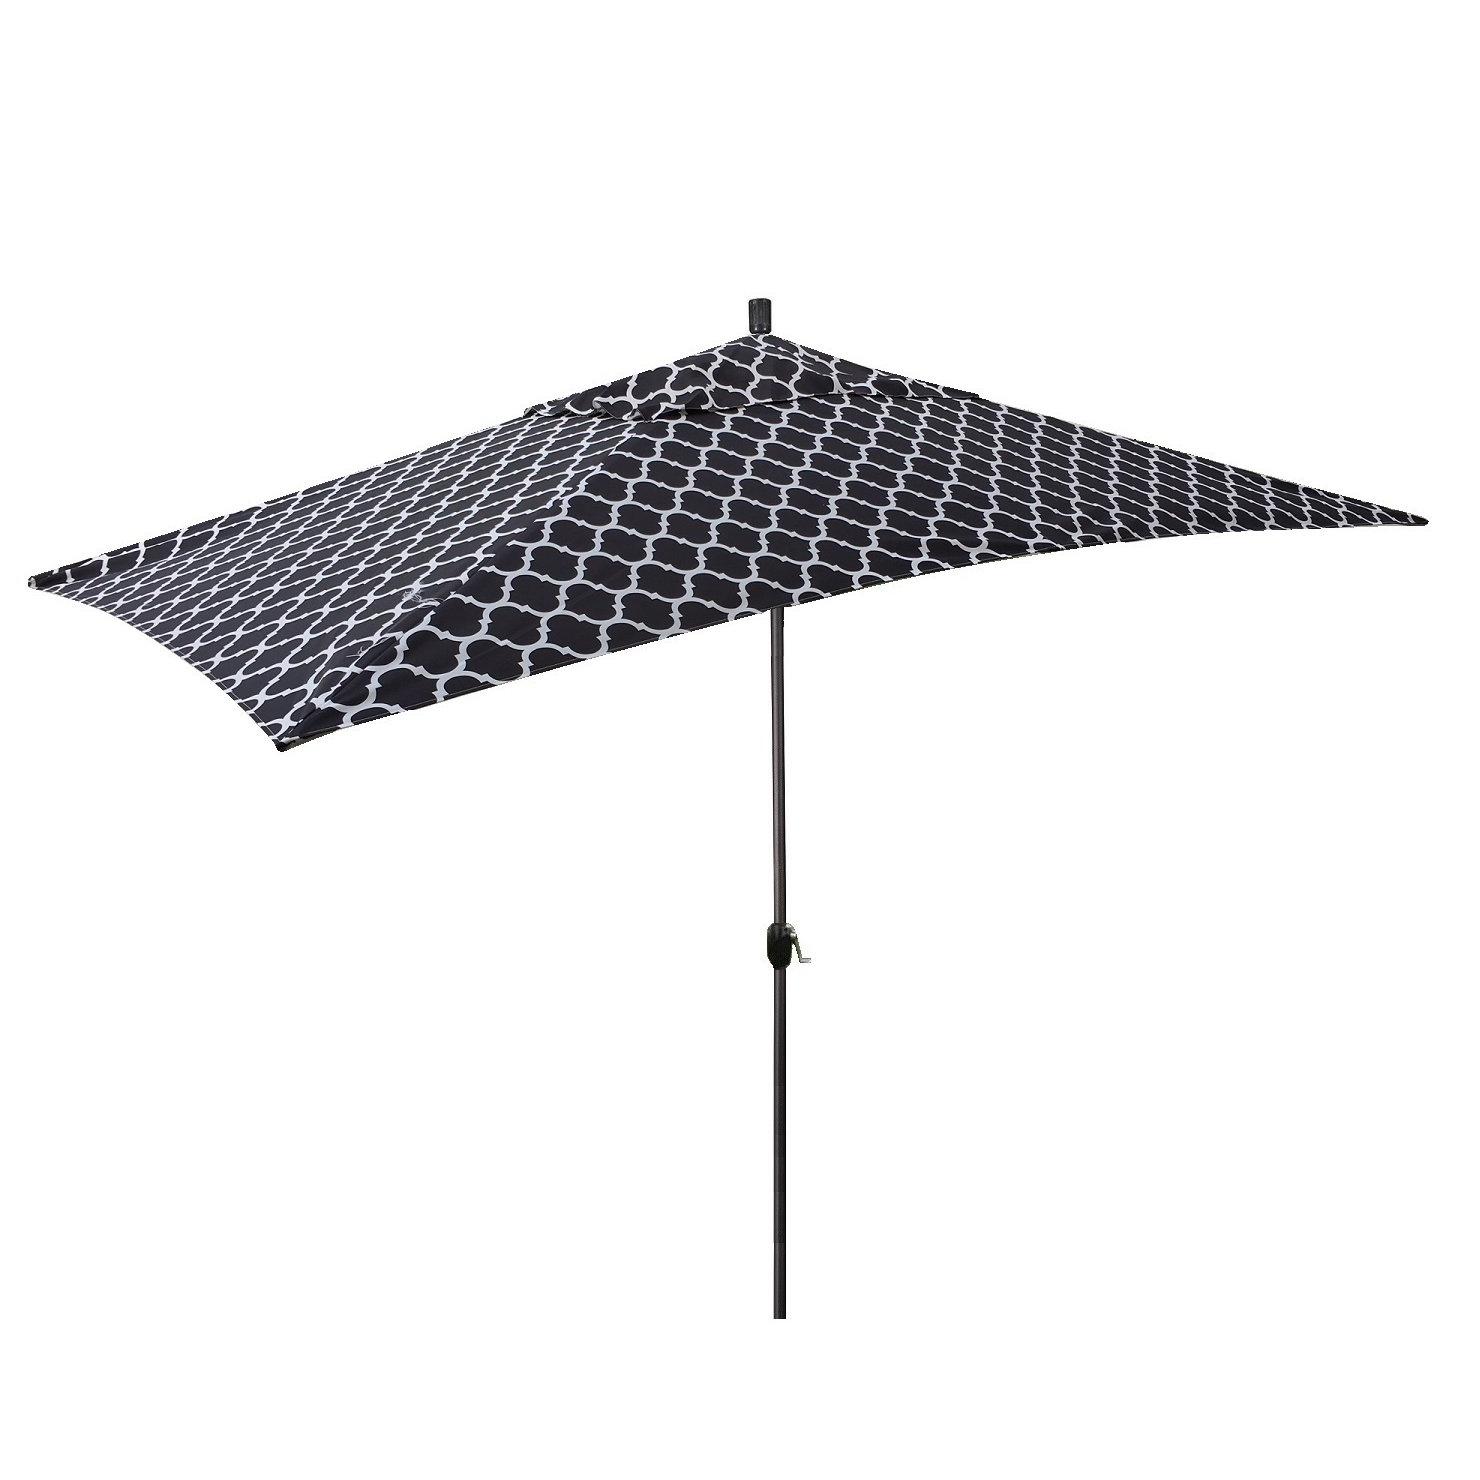 Sherlyn 10' X 6' Rectangular Market Umbrella Regarding Famous Northfleet Rectangular Market Umbrellas (View 6 of 20)